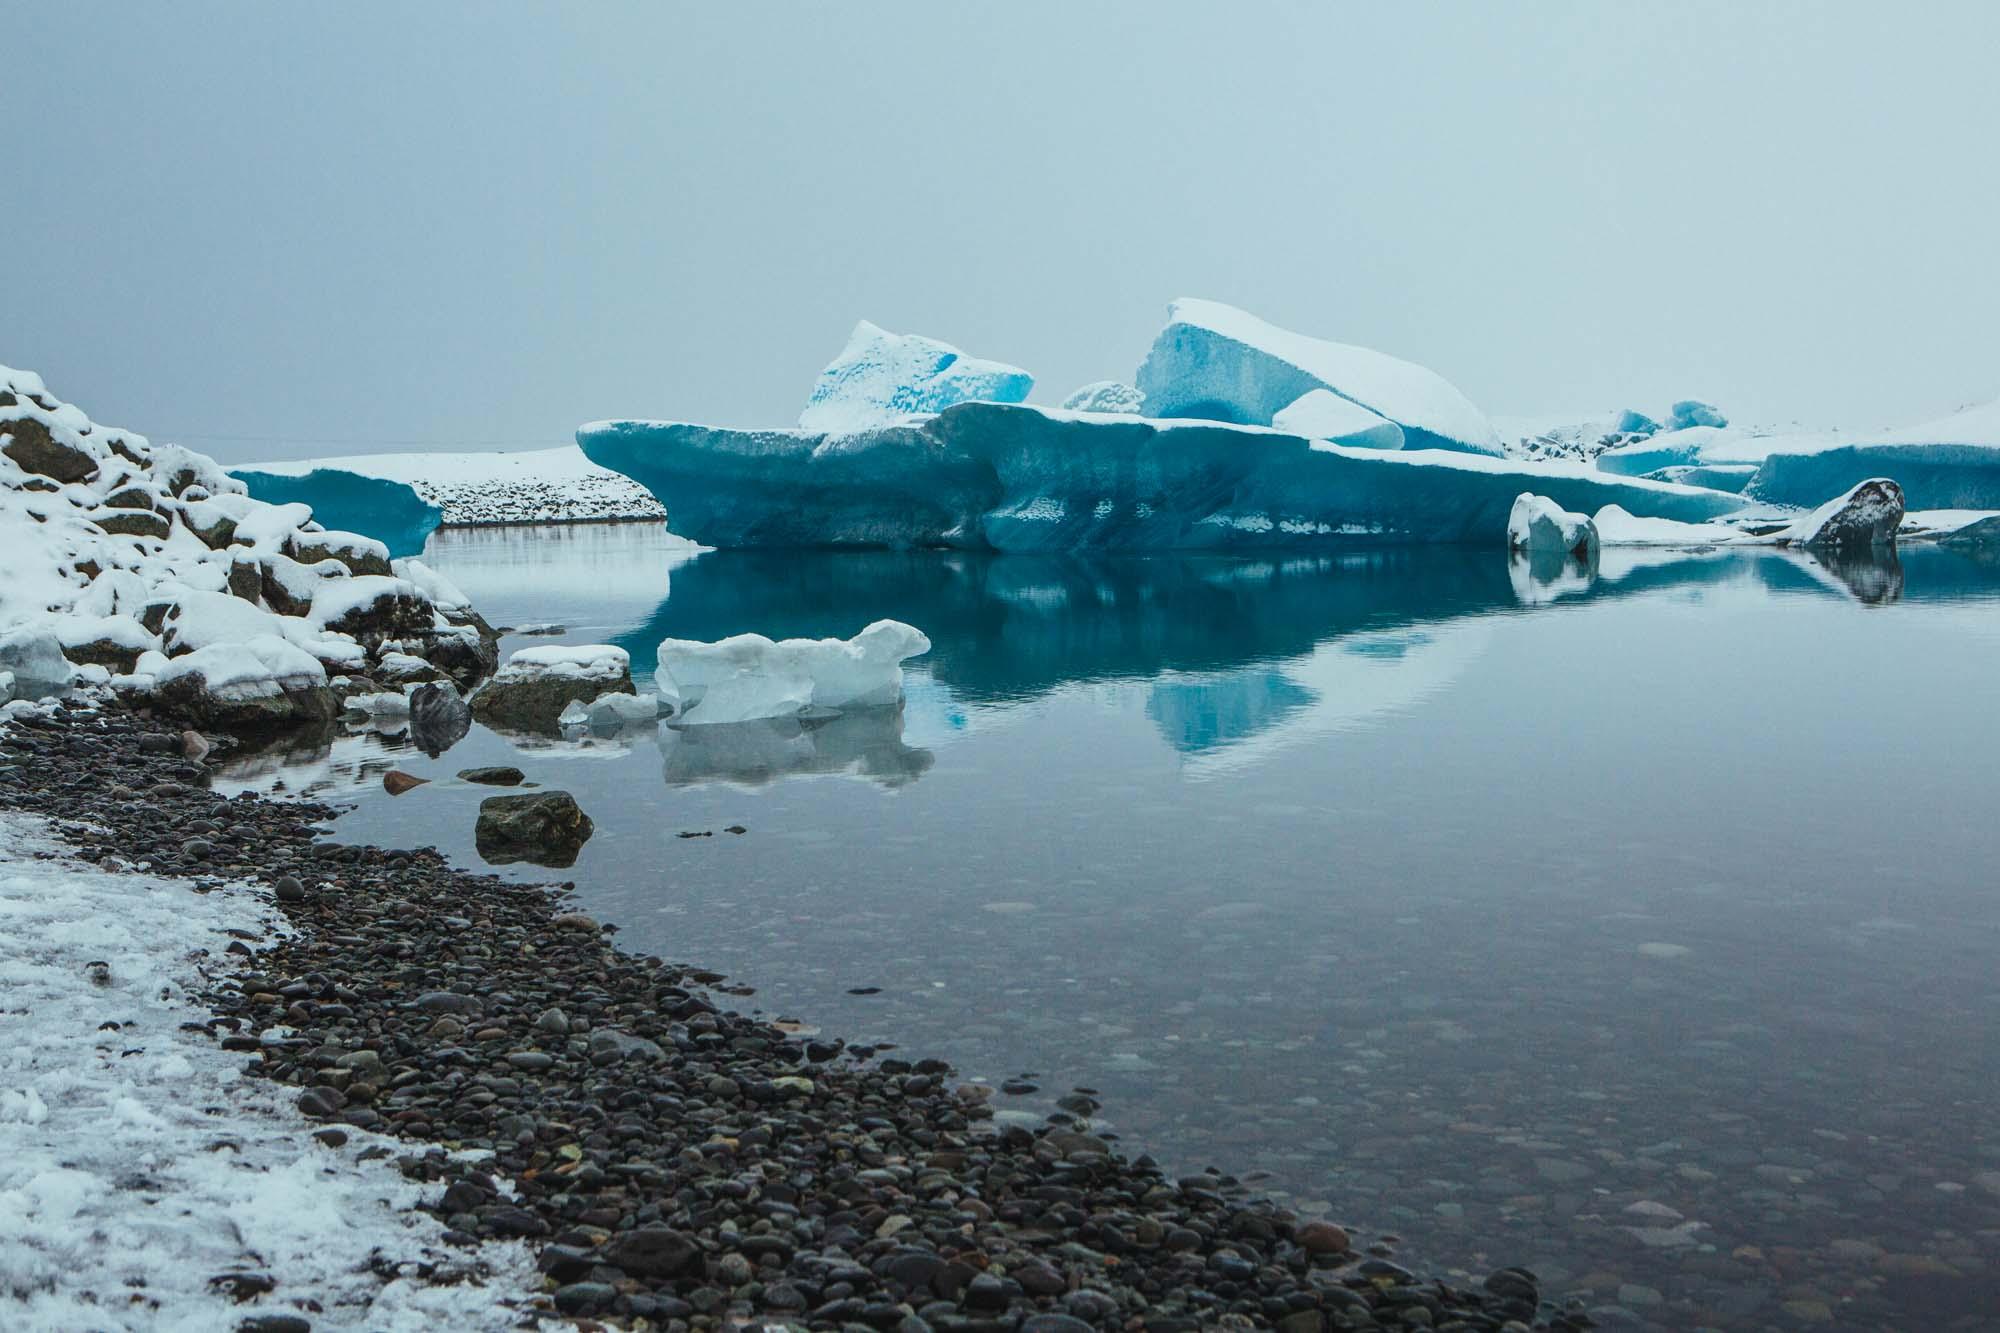 Iceland photo inspiration – Jokulsarlon